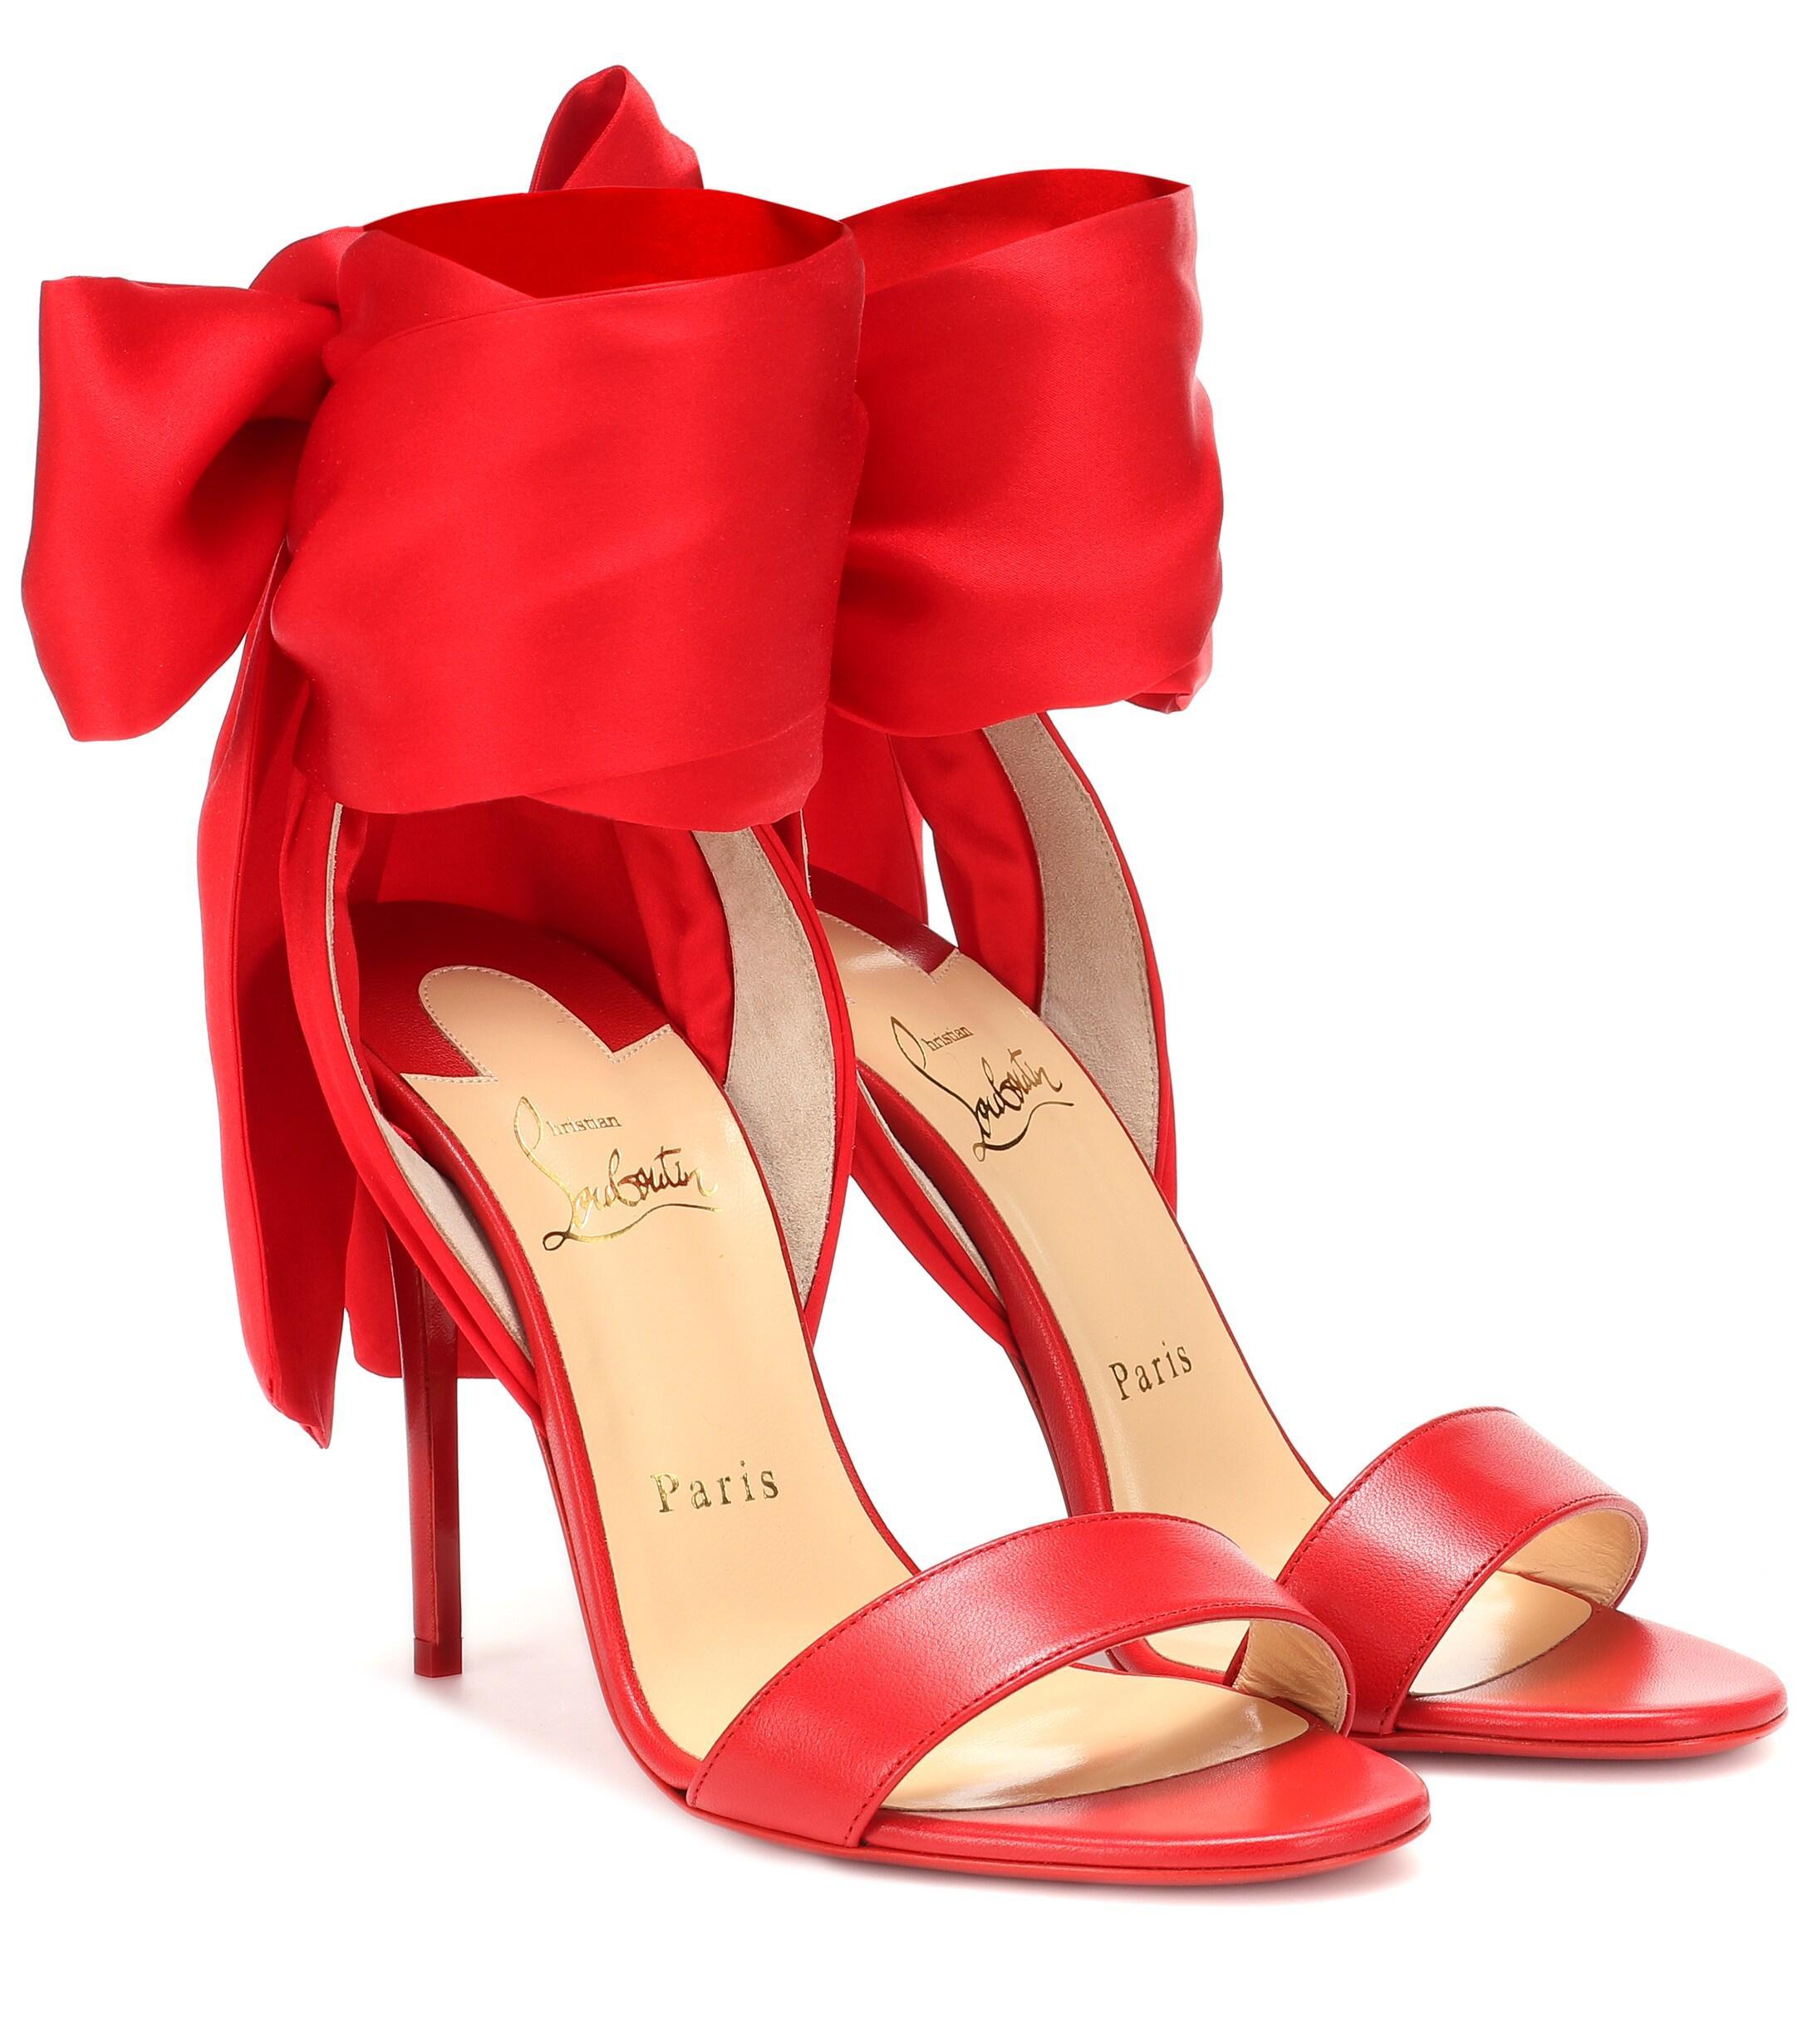 6773546e47a8 Lyst - Christian Louboutin Sandale Du Désert 100 Sandals in Red